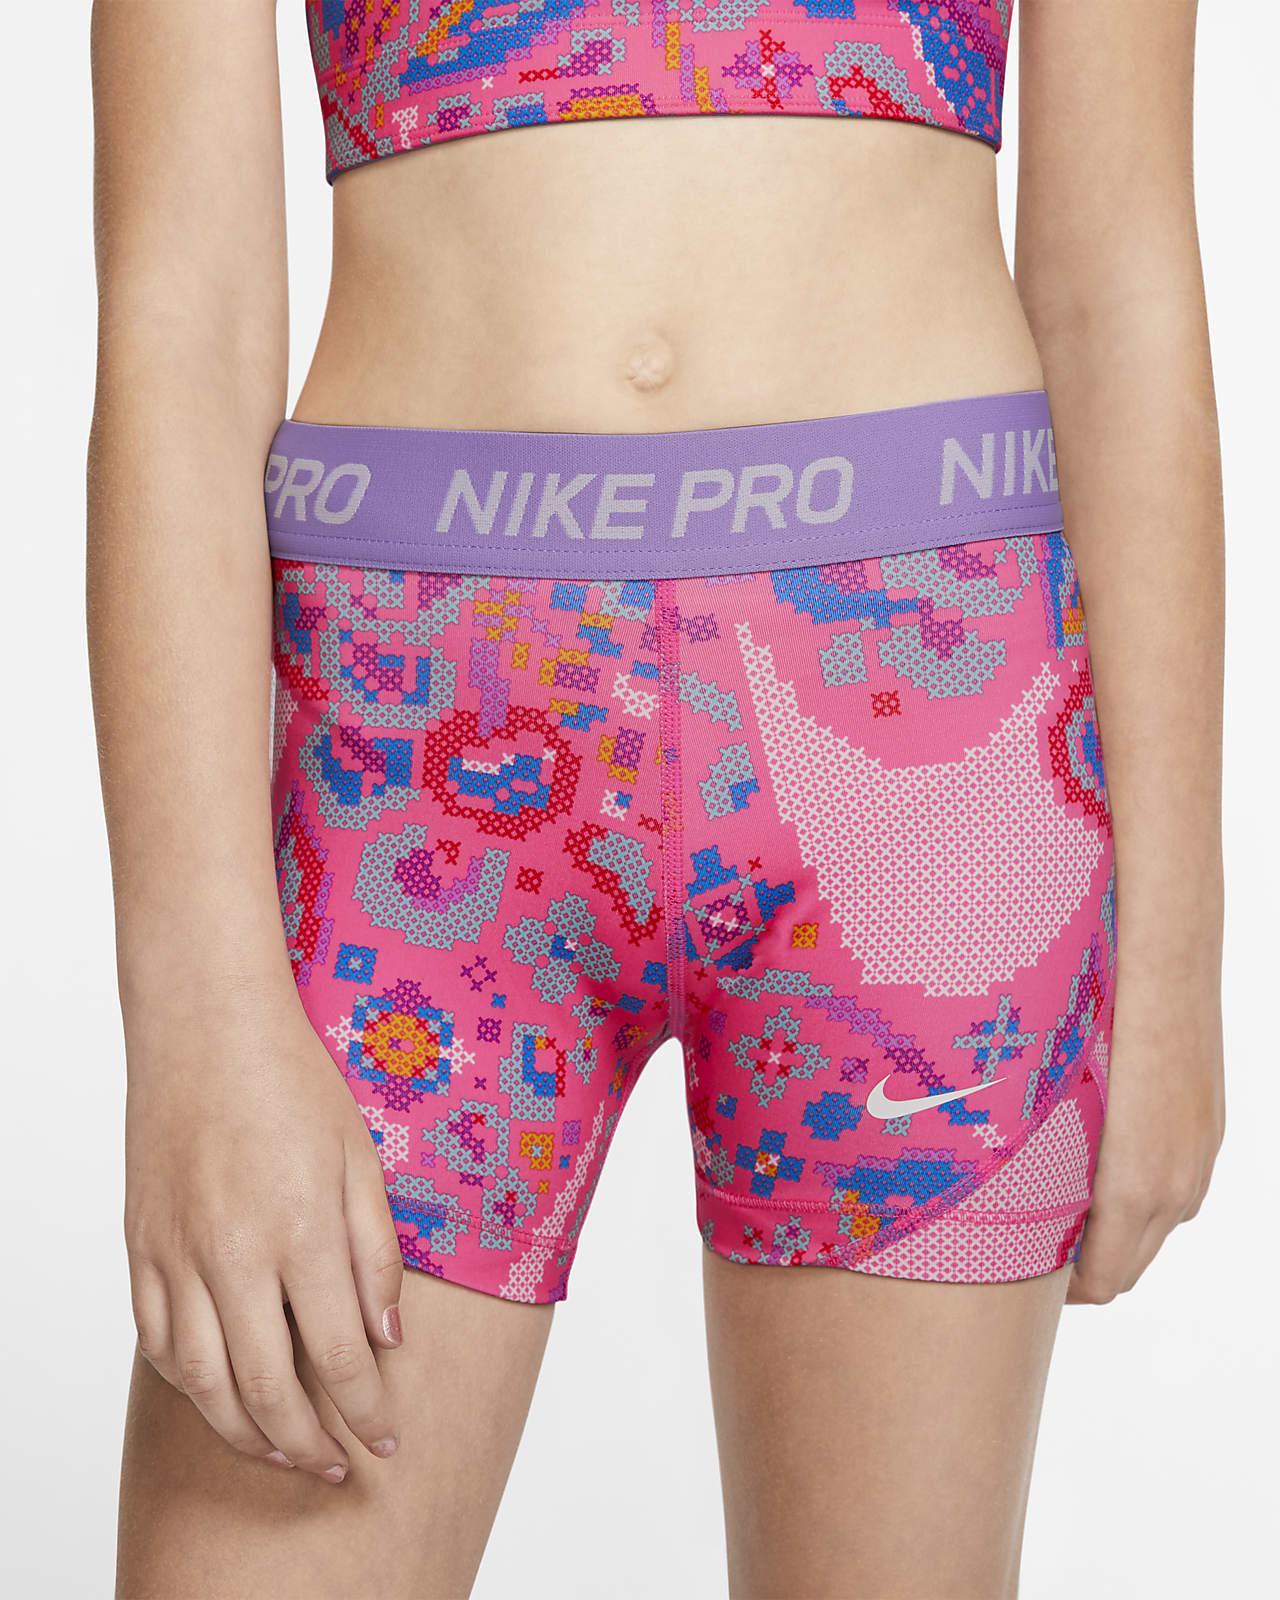 Nike Pro Boyshorts mit Print für ältere Kinder (Mädchen)